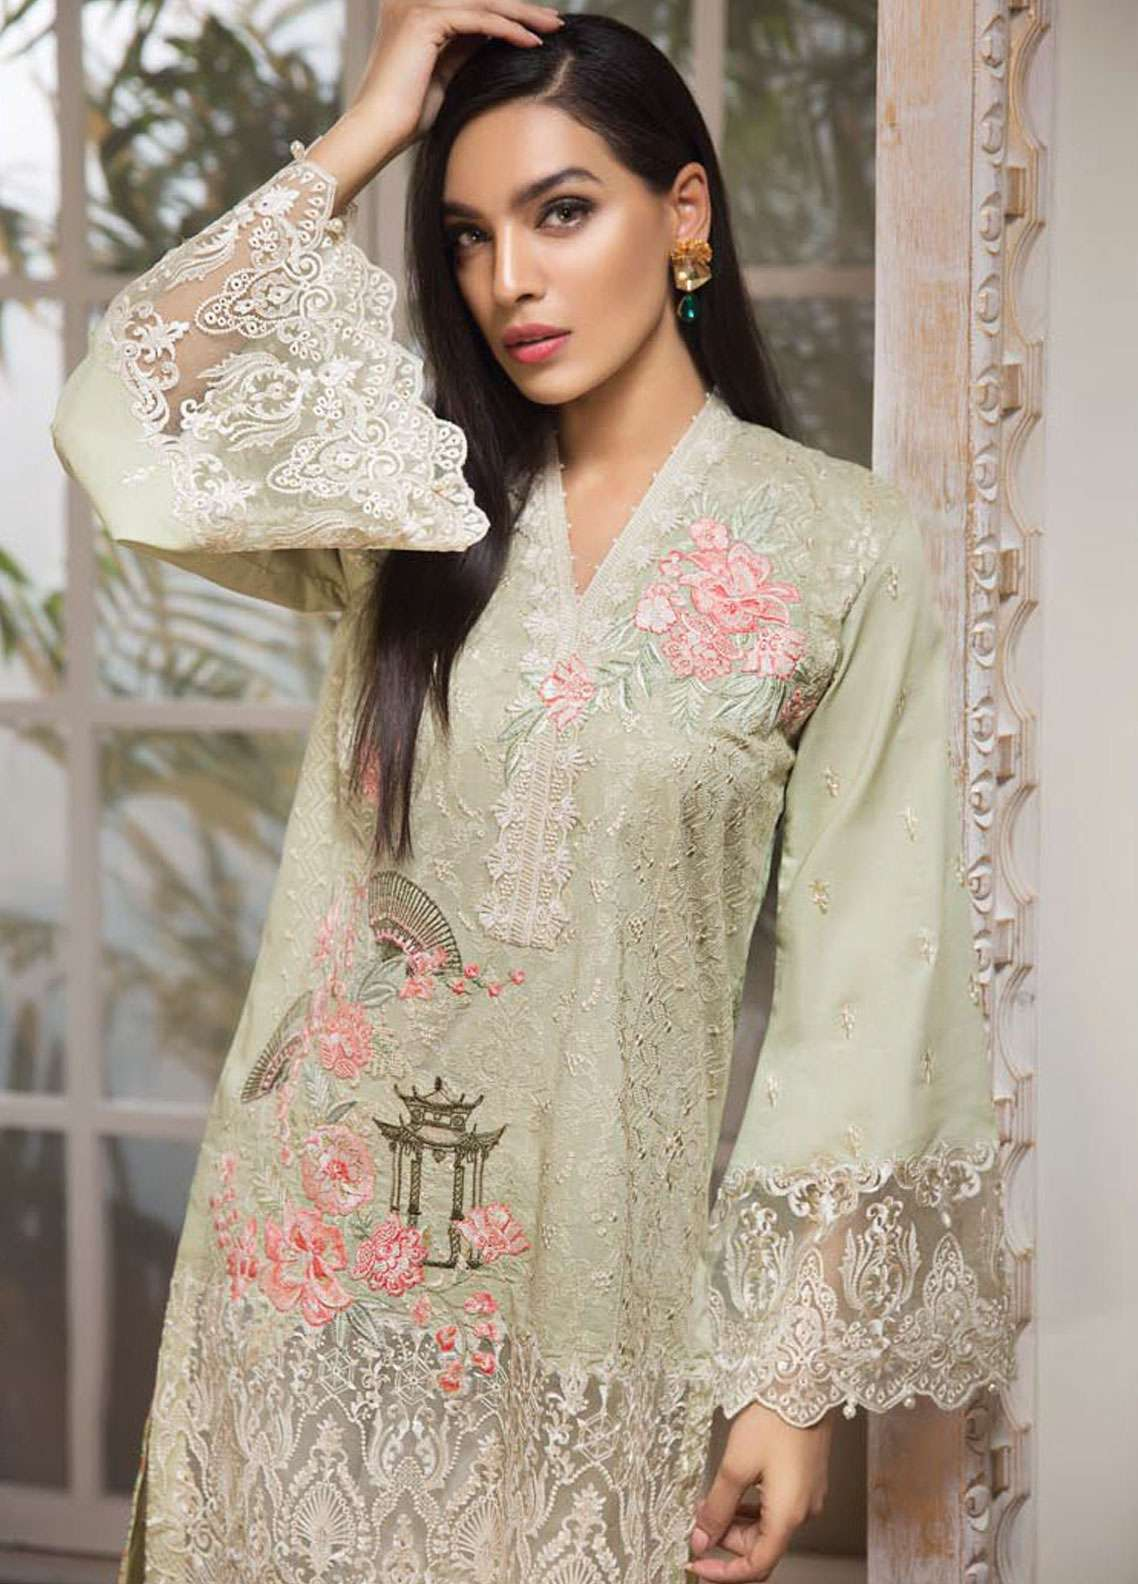 3cb7720d8e Anaya by Kiran Chaudhry Luxury Lawn 2019 Collection   Ete de L'Amour ...